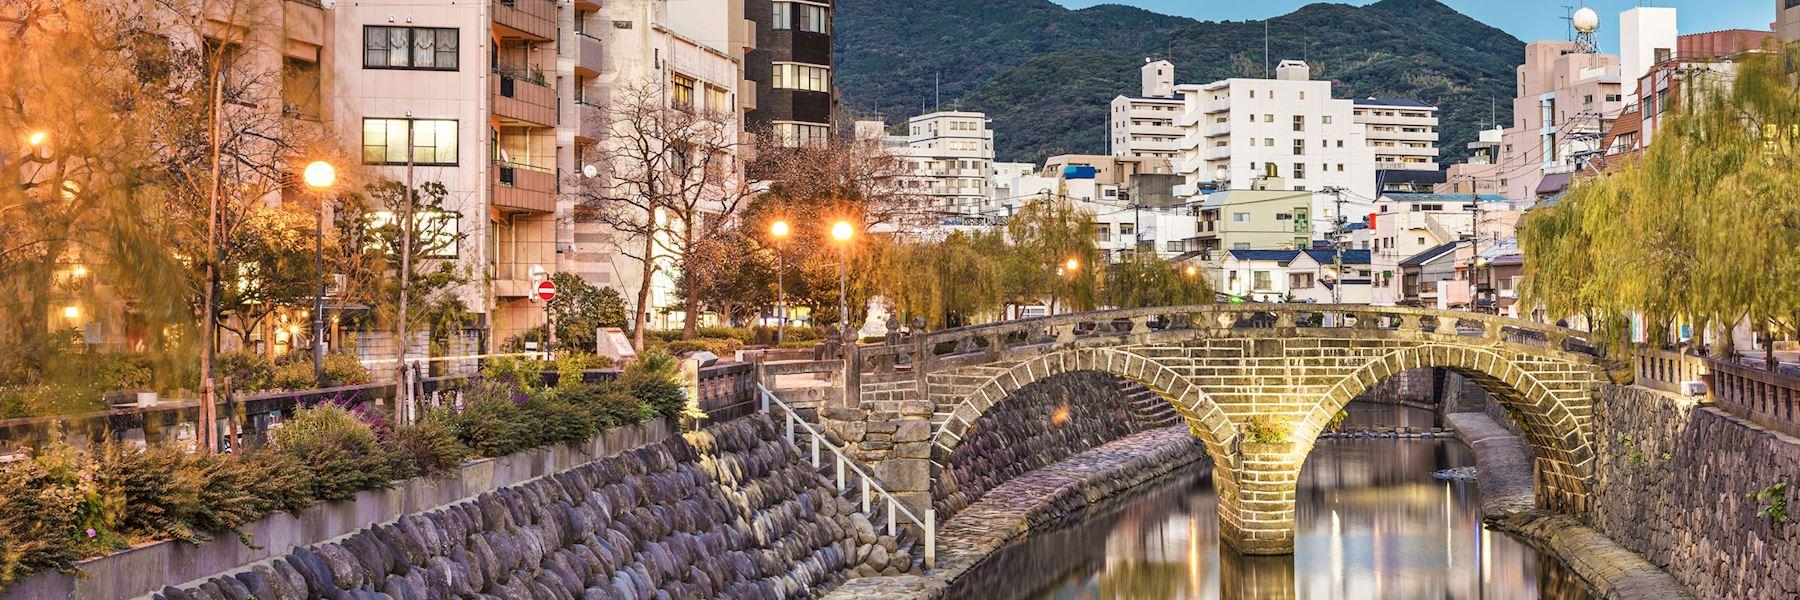 Visit Nagasaki, Japan